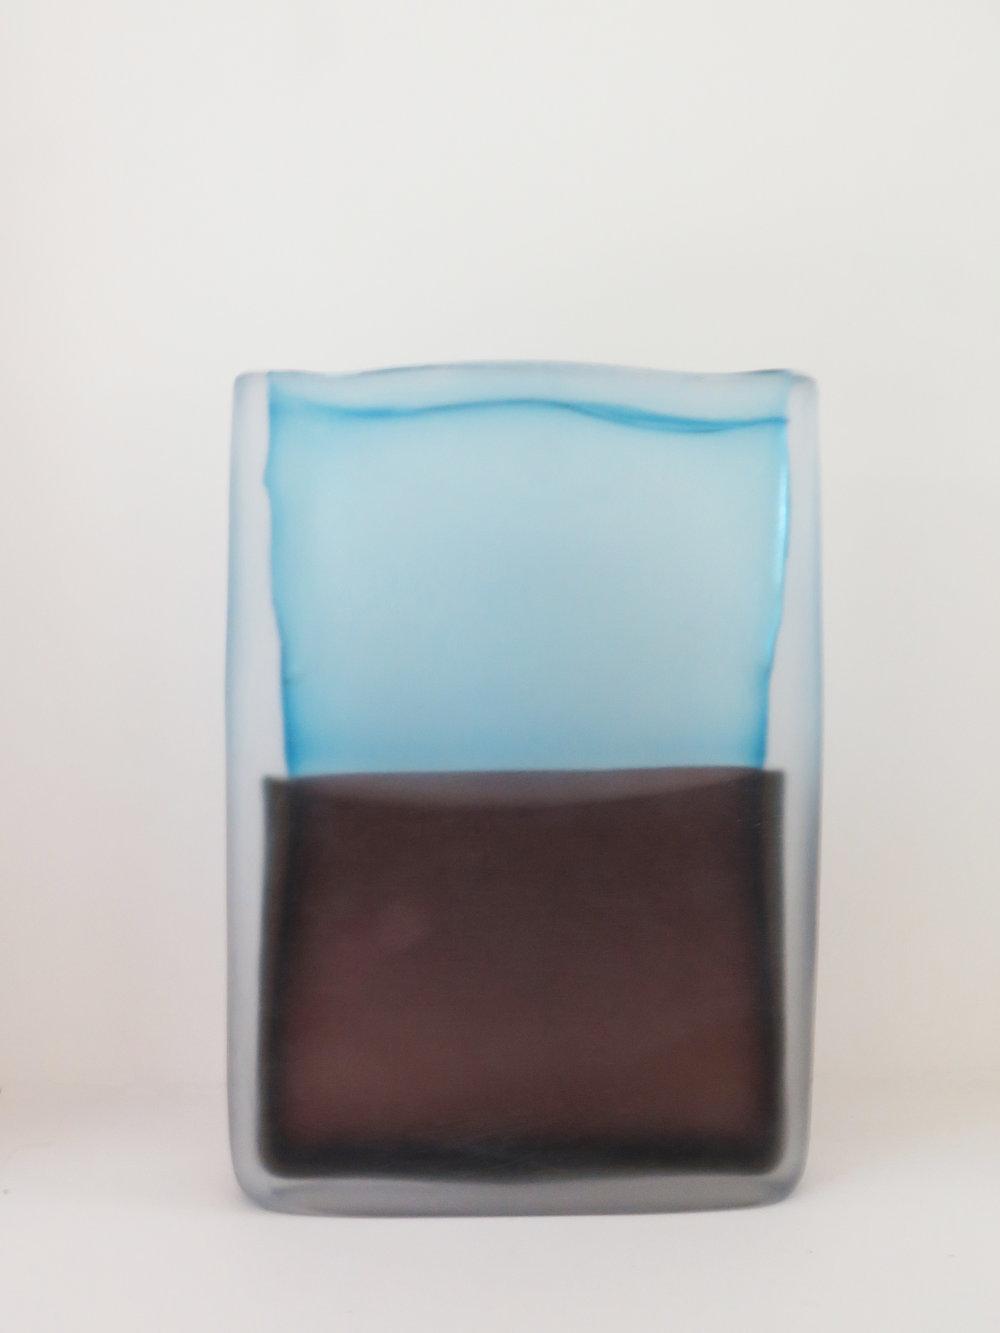 Laura de Santillana  Tokyo-Ga (Sky Blue - Warm Brown) , 2018 hand blown compressed shaped glass 12 1/5 x 8 2/3 x 1 1/2 in (31 x 22 x 4 cm)